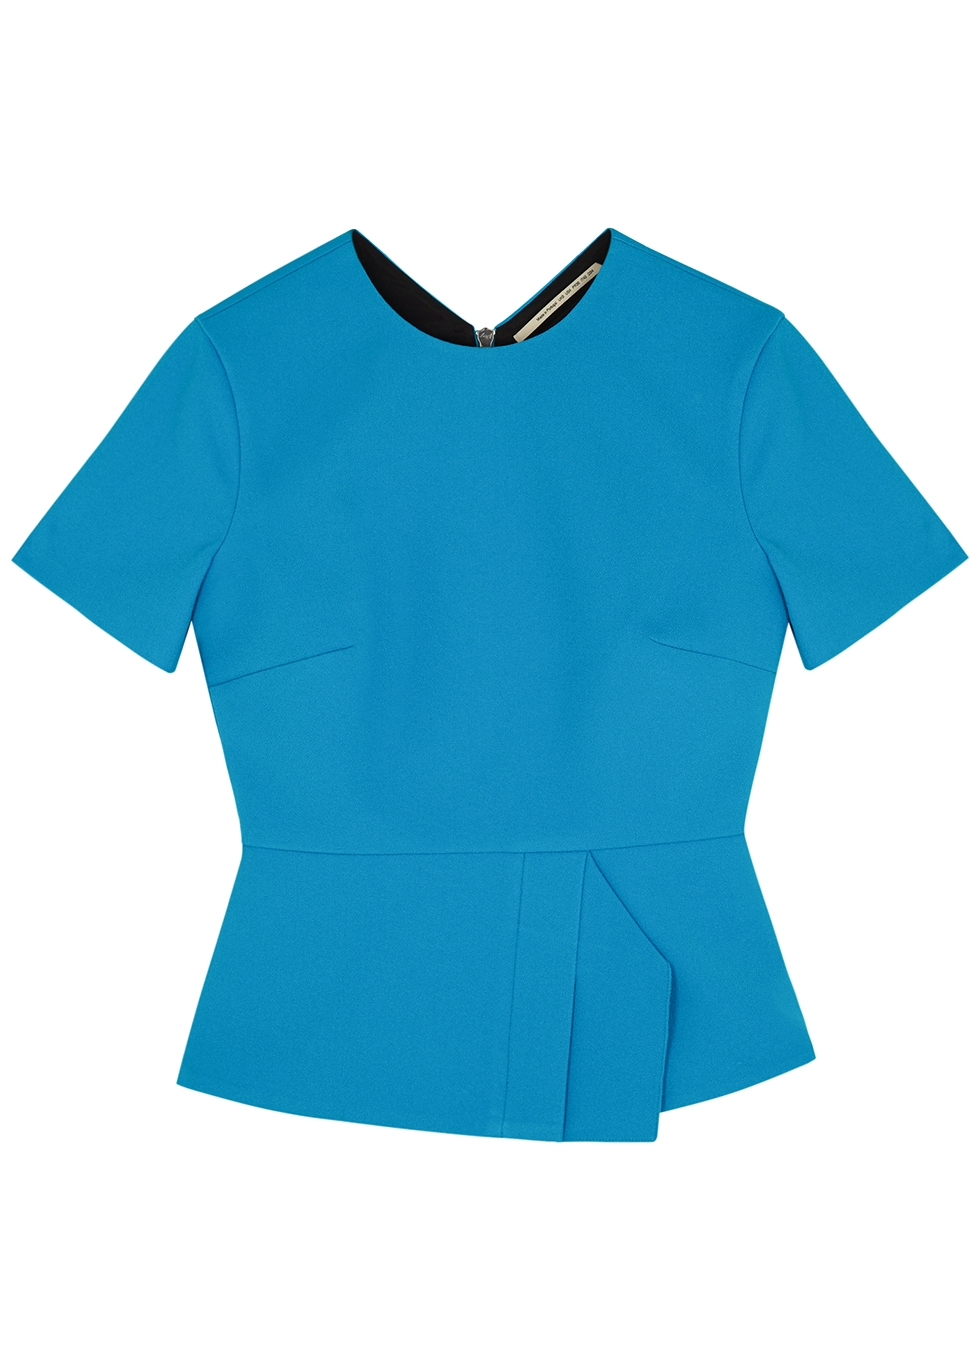 Roseland blue top